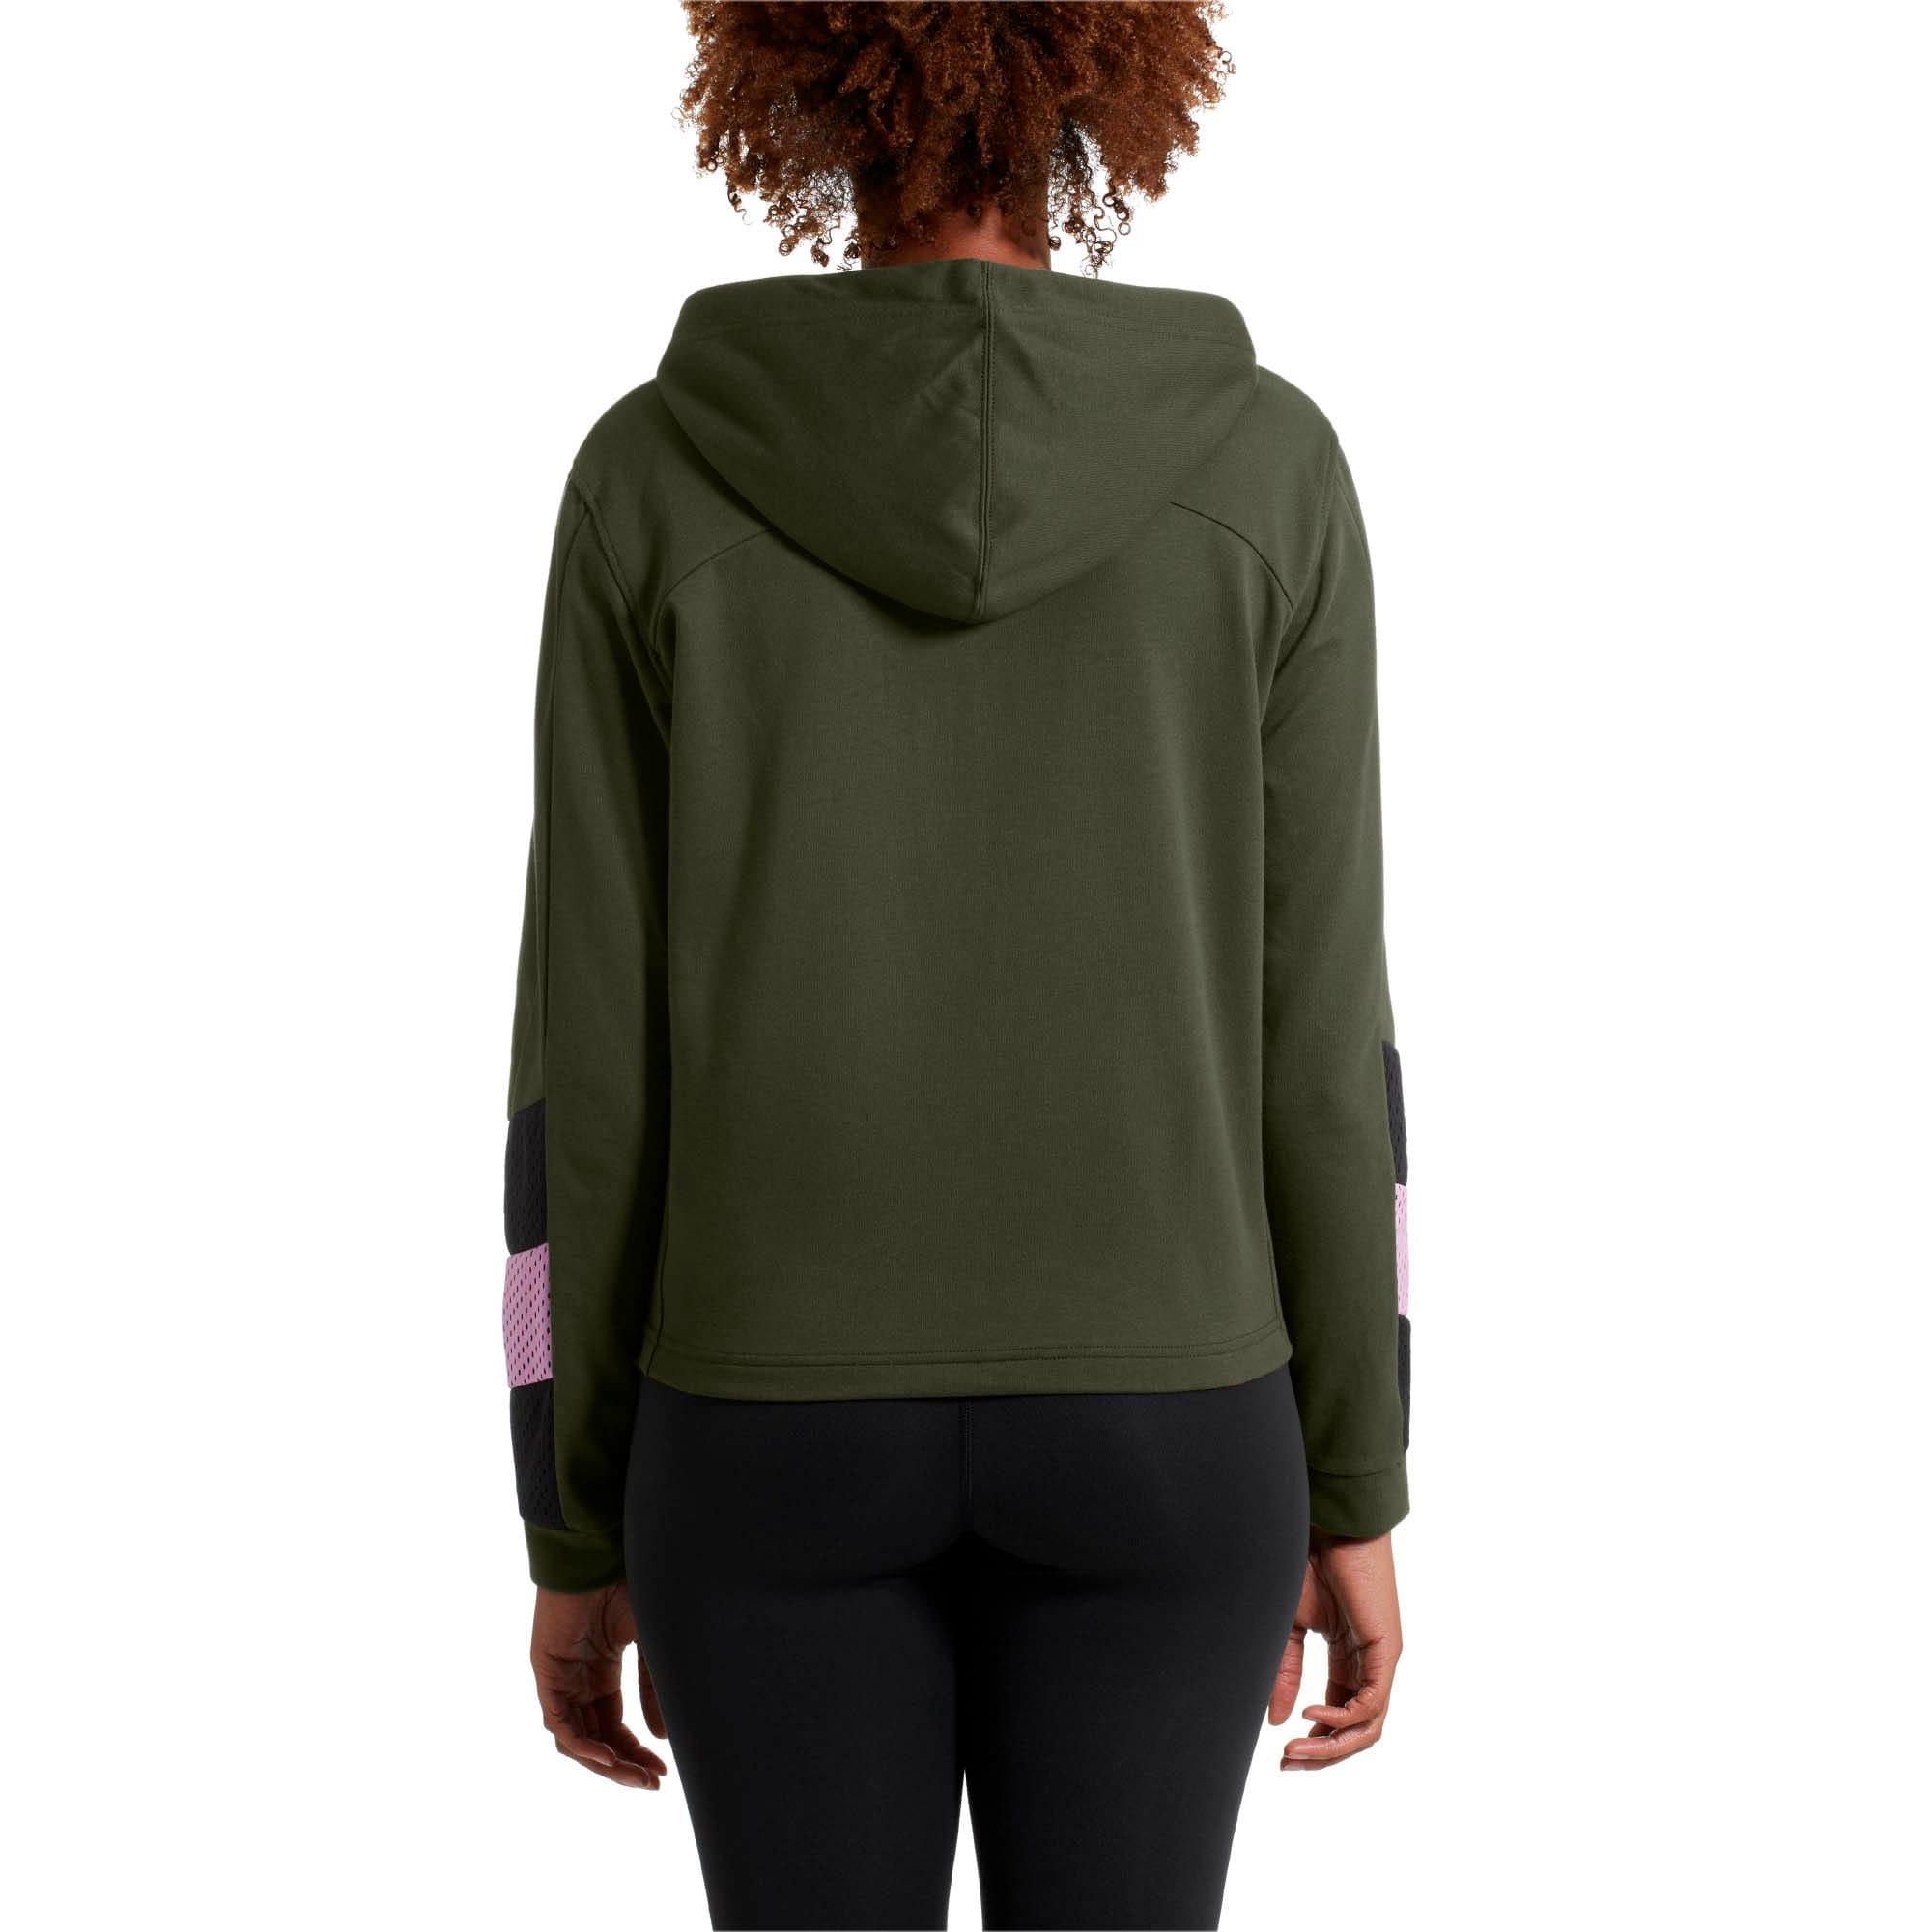 Thumbnail 3 of Training Women's A.C.E. Sweat Jacket, Forest Night, medium